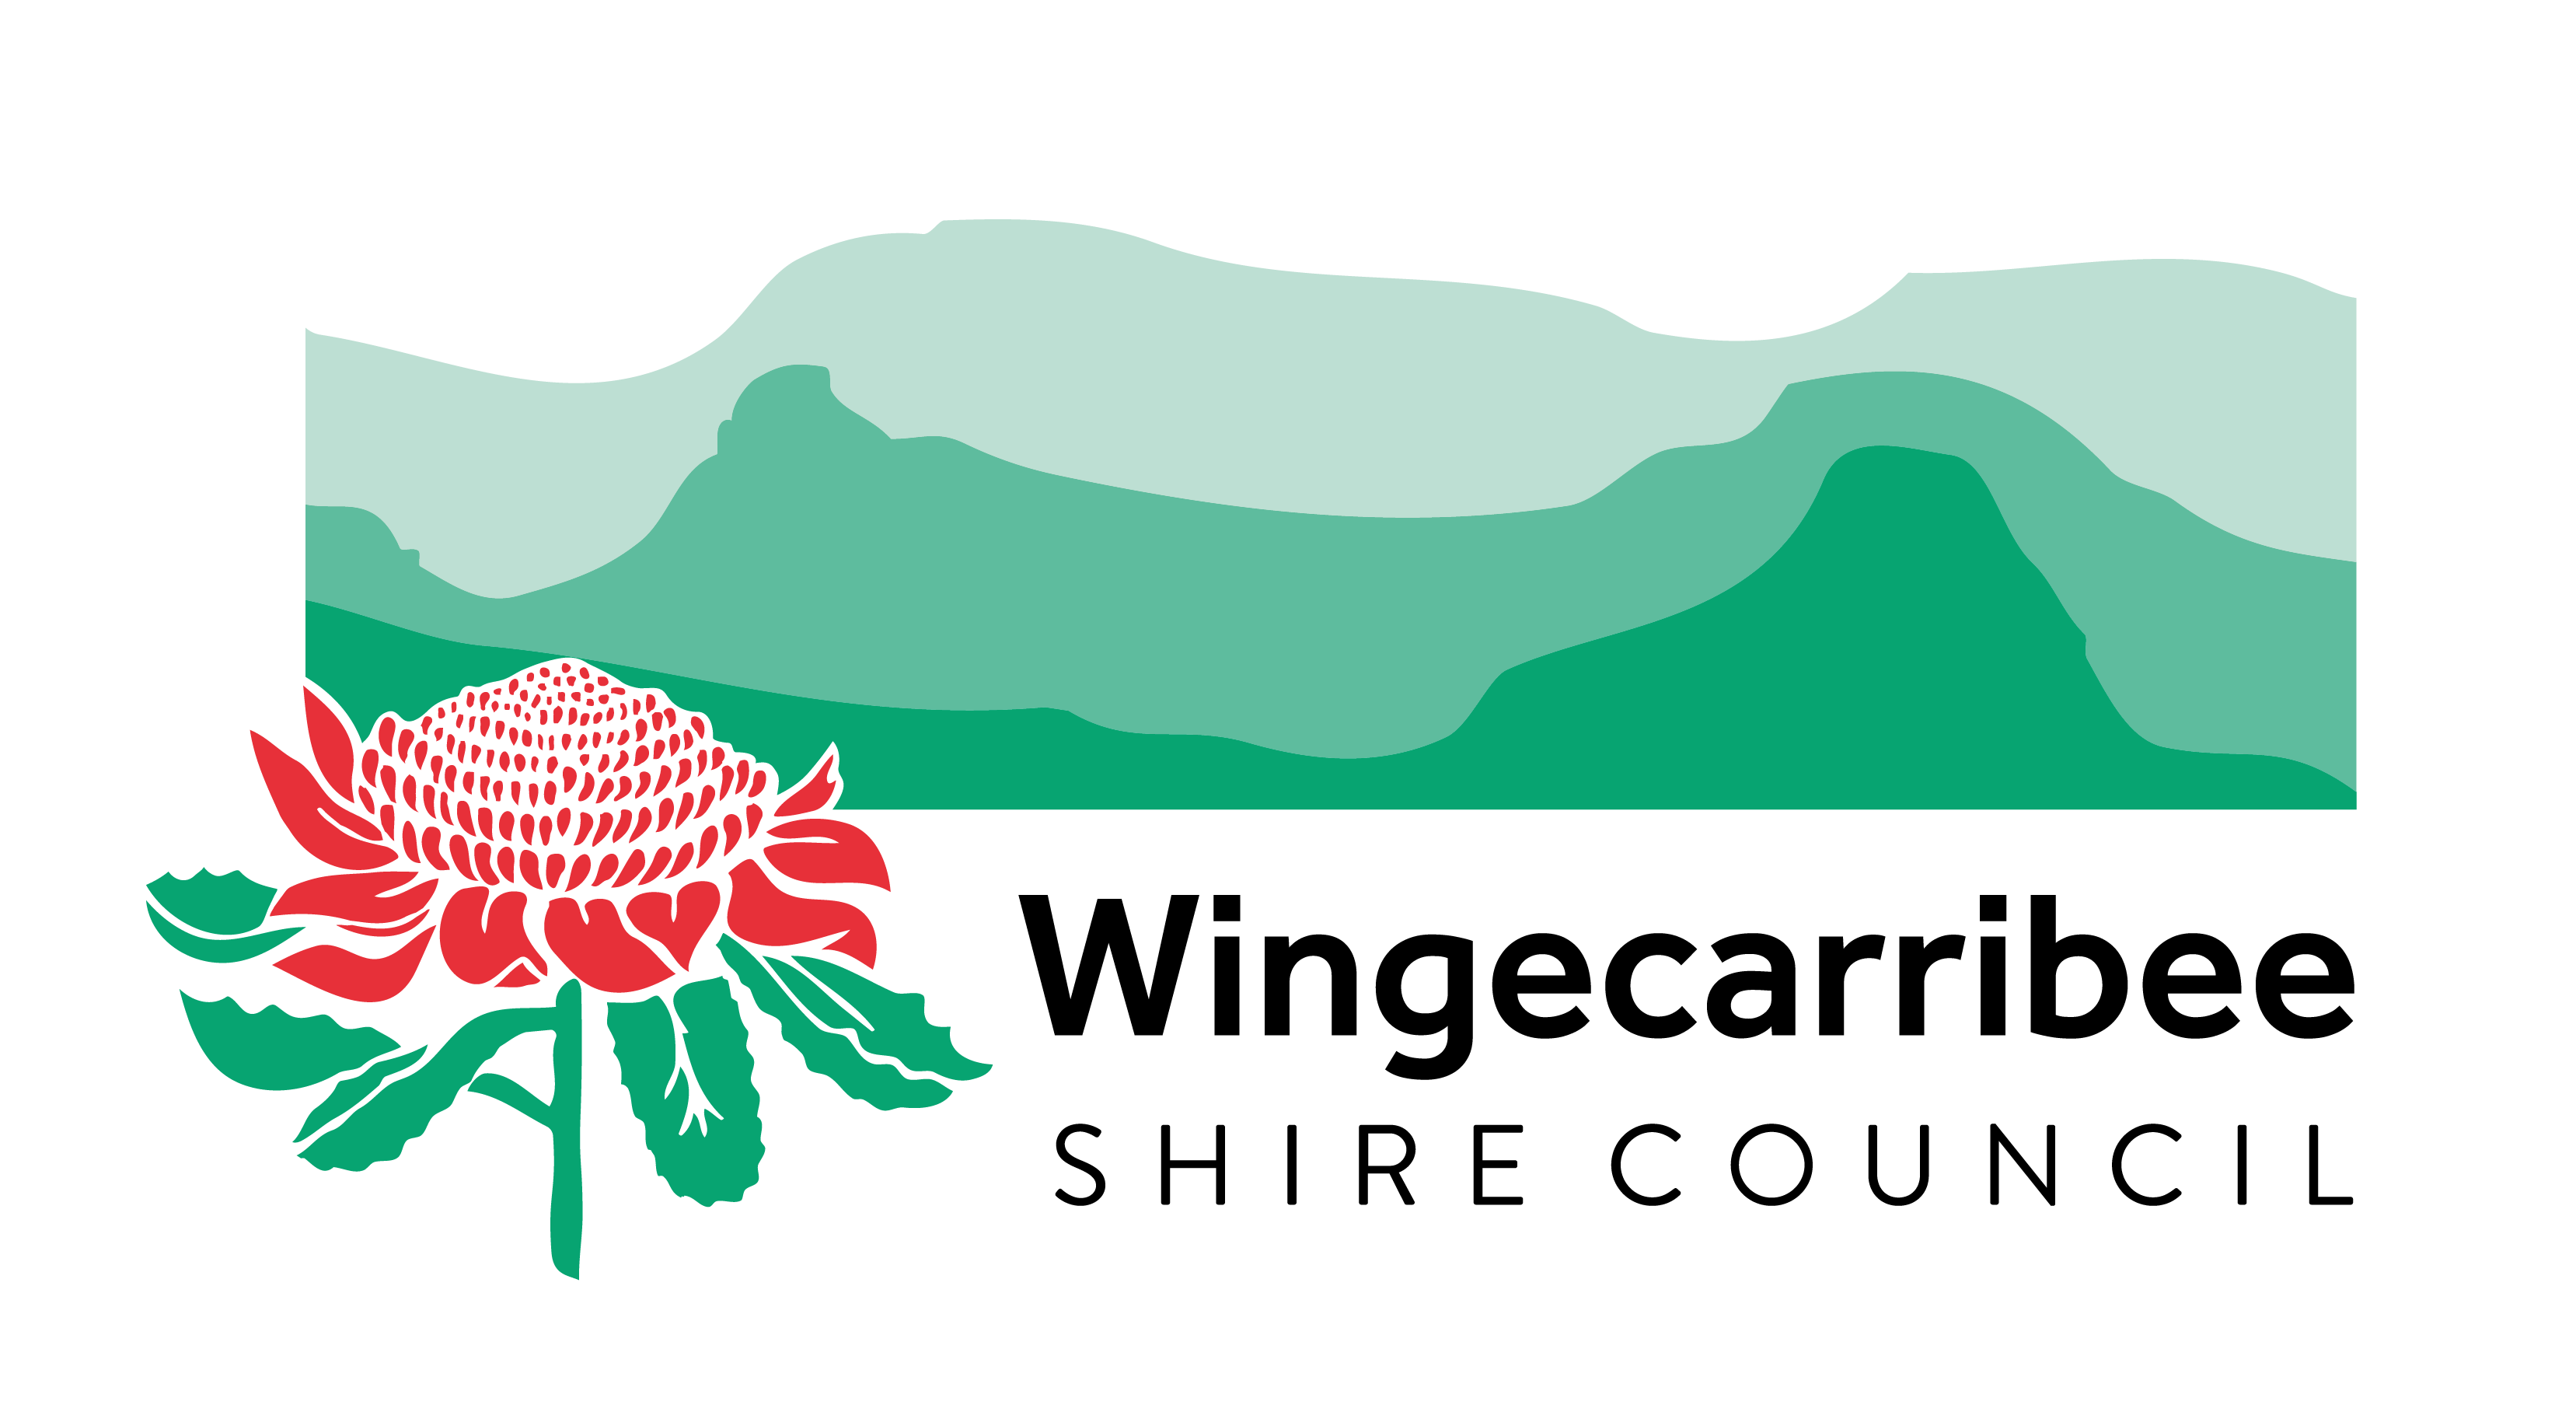 Wingecarribee Shire Council logo